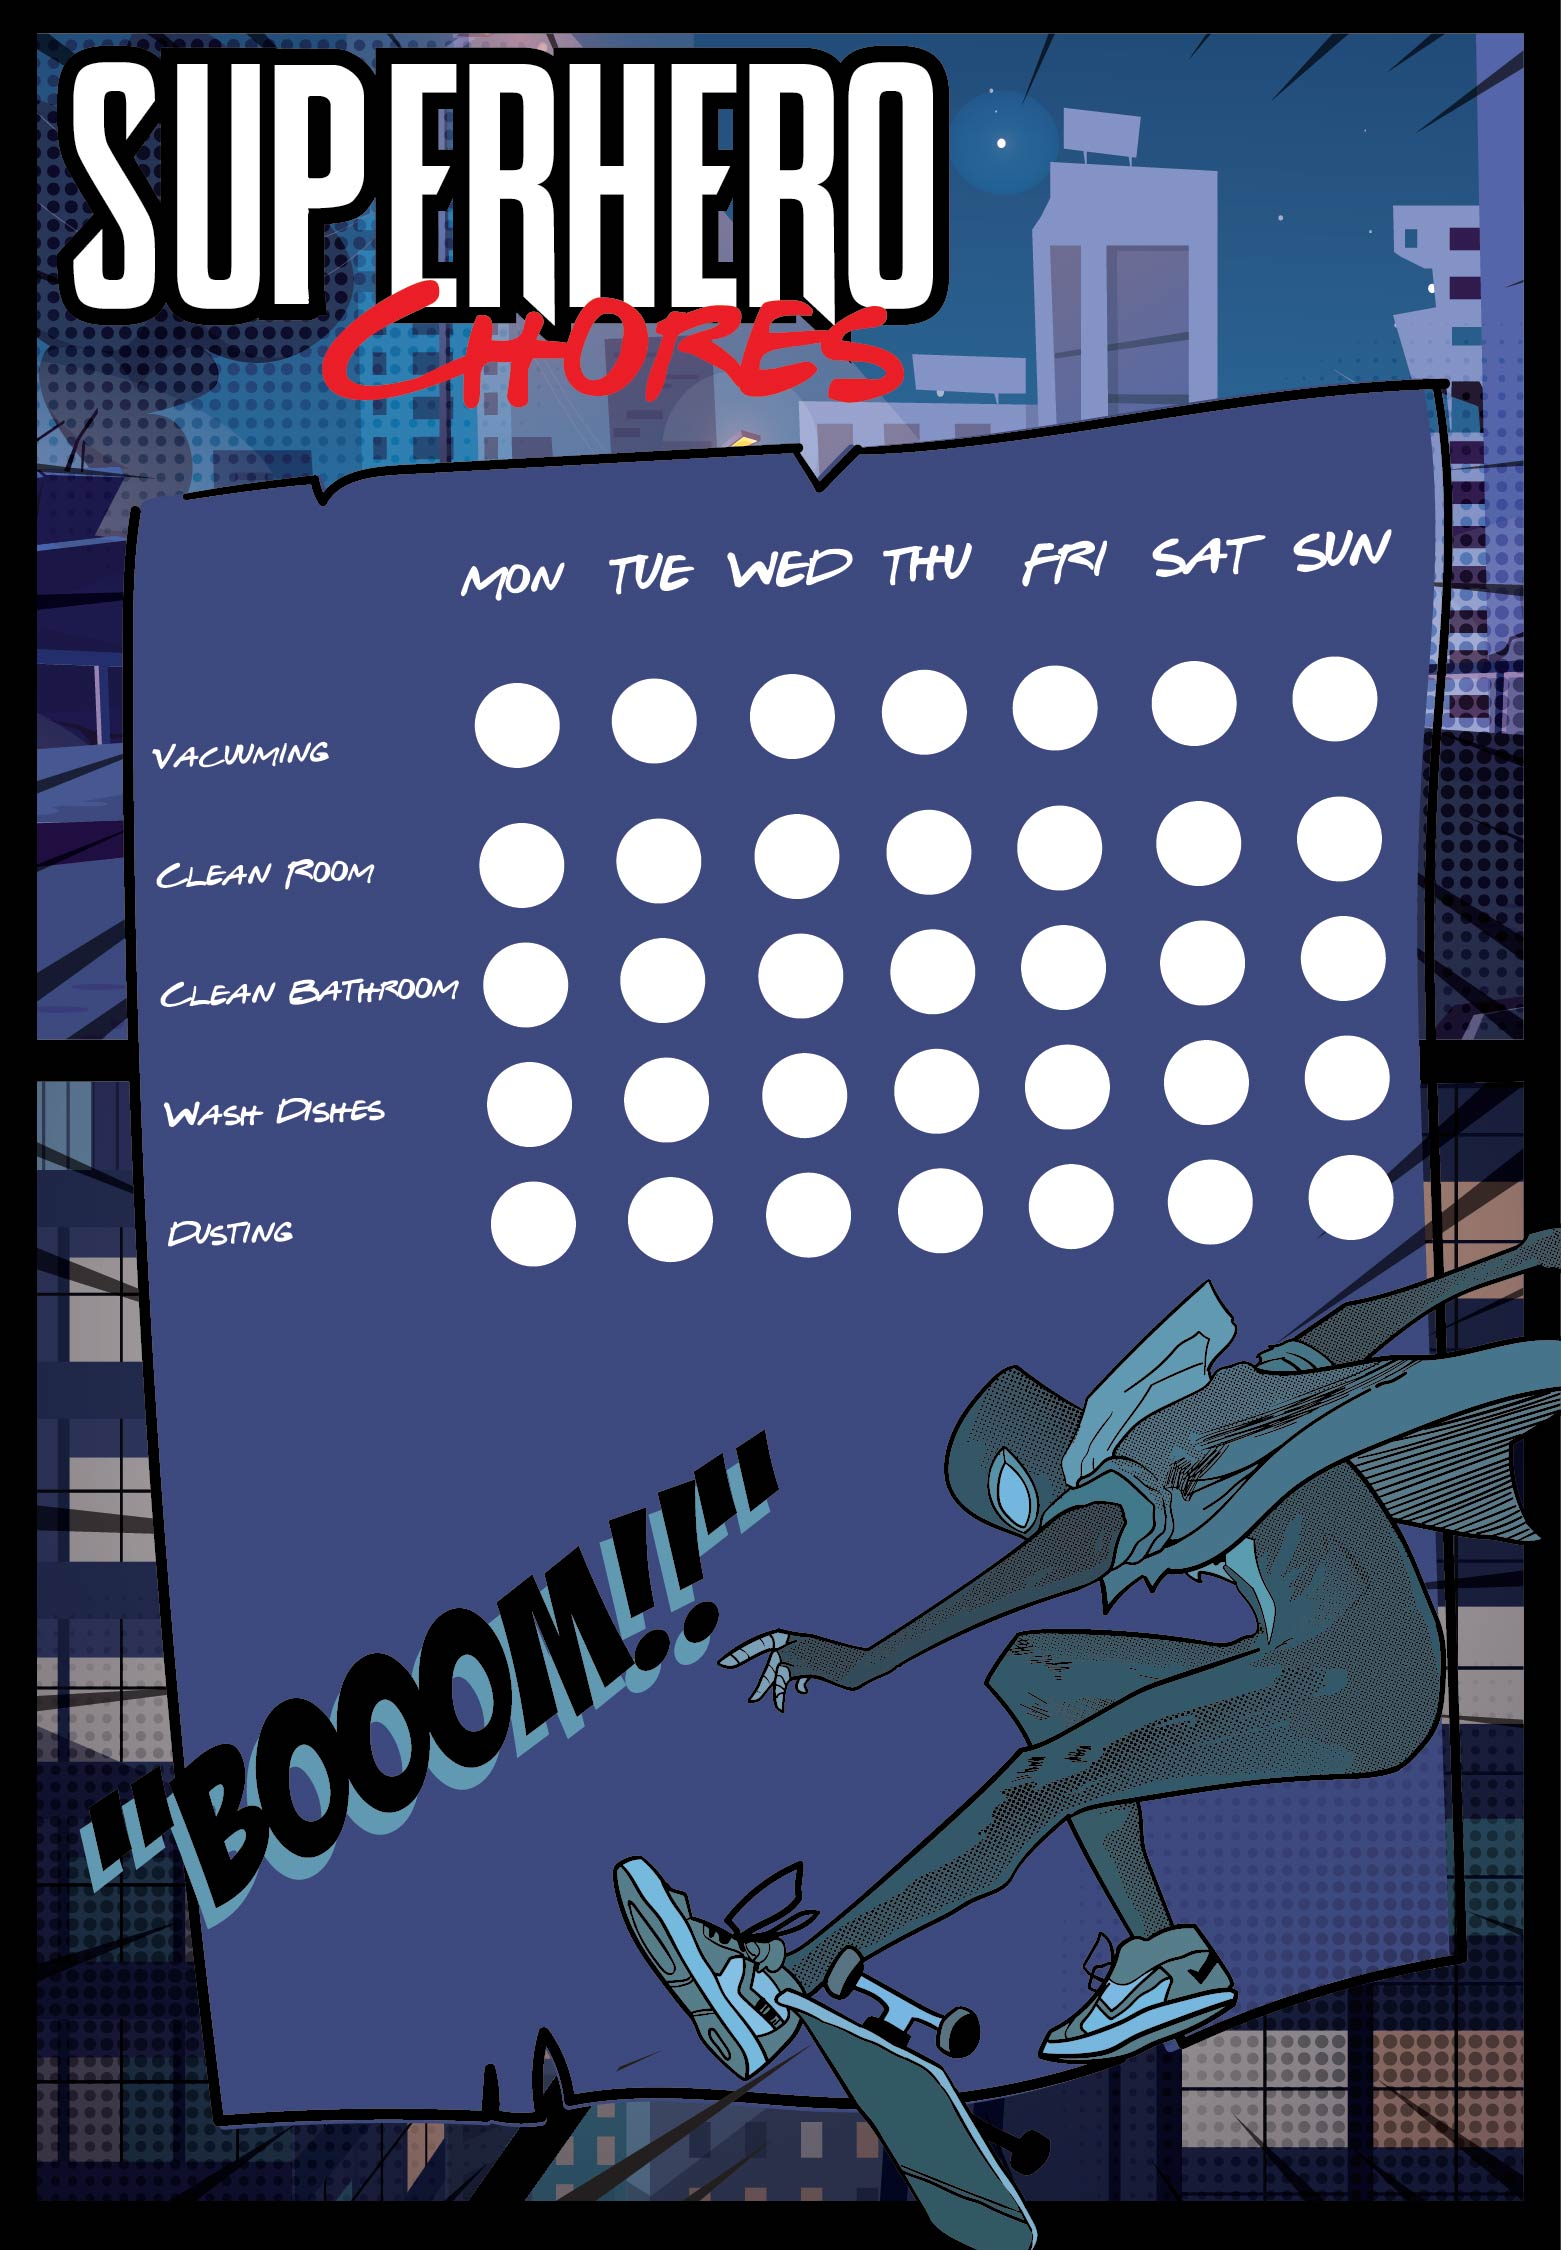 Printable Superhero Chore Chart